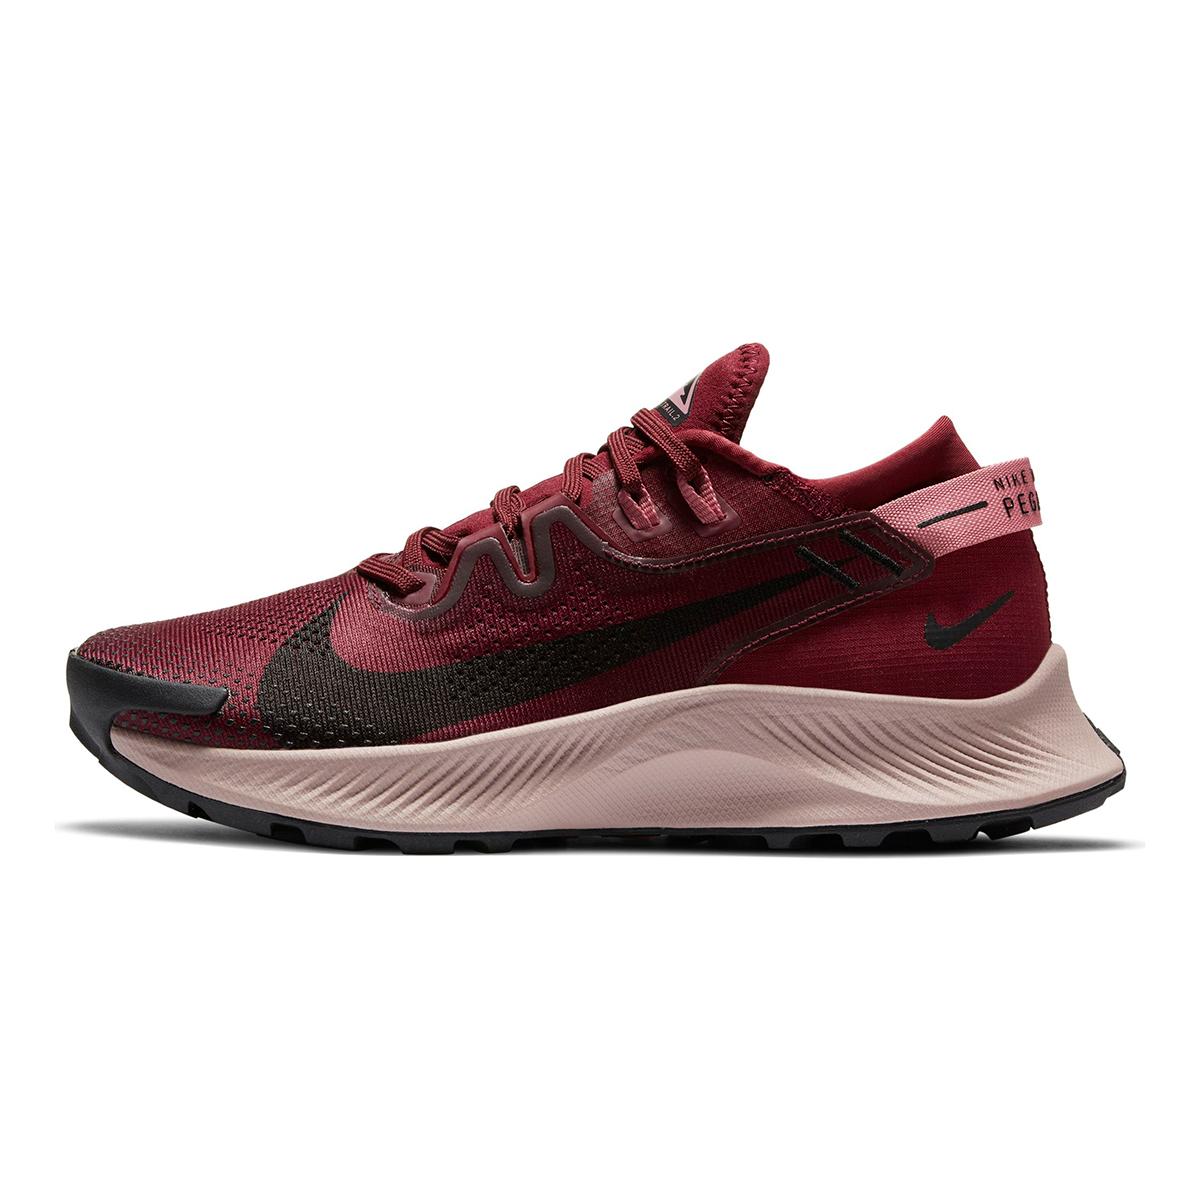 Women's Nike Pegasus Trail 2 Trail Running Shoe - Color: Dark Beetroot/Desert Berry/Platinum Tint/Black - Size: 5 - Width: Regular, Dark Beetroot/Desert Berry/Platinum Tint/Black, large, image 3